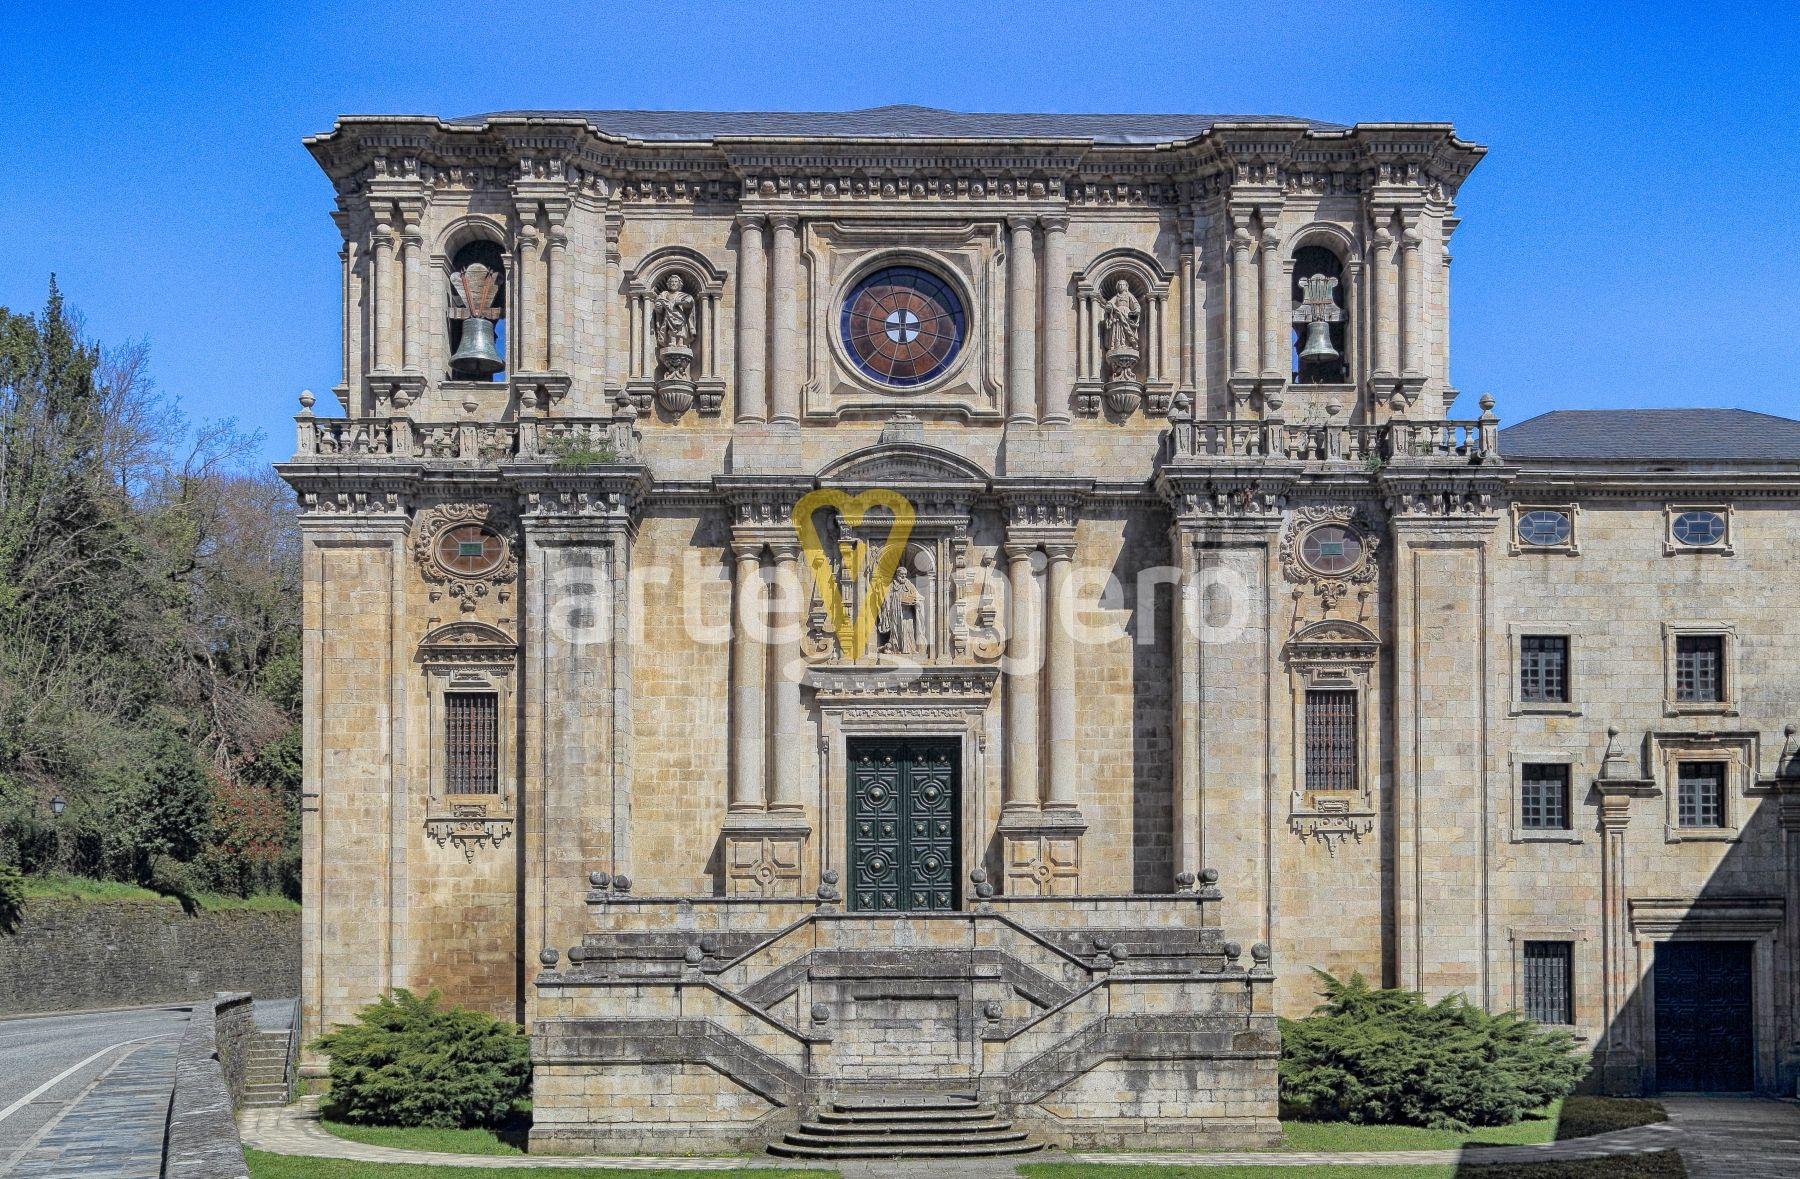 Monasterio De Samos Lugo Vista De La Fachada De Estilo Barroco Monasteriodesamos Barroco Lugo Galicia Arquitect Fachadas De Iglesias Monasterios Samos